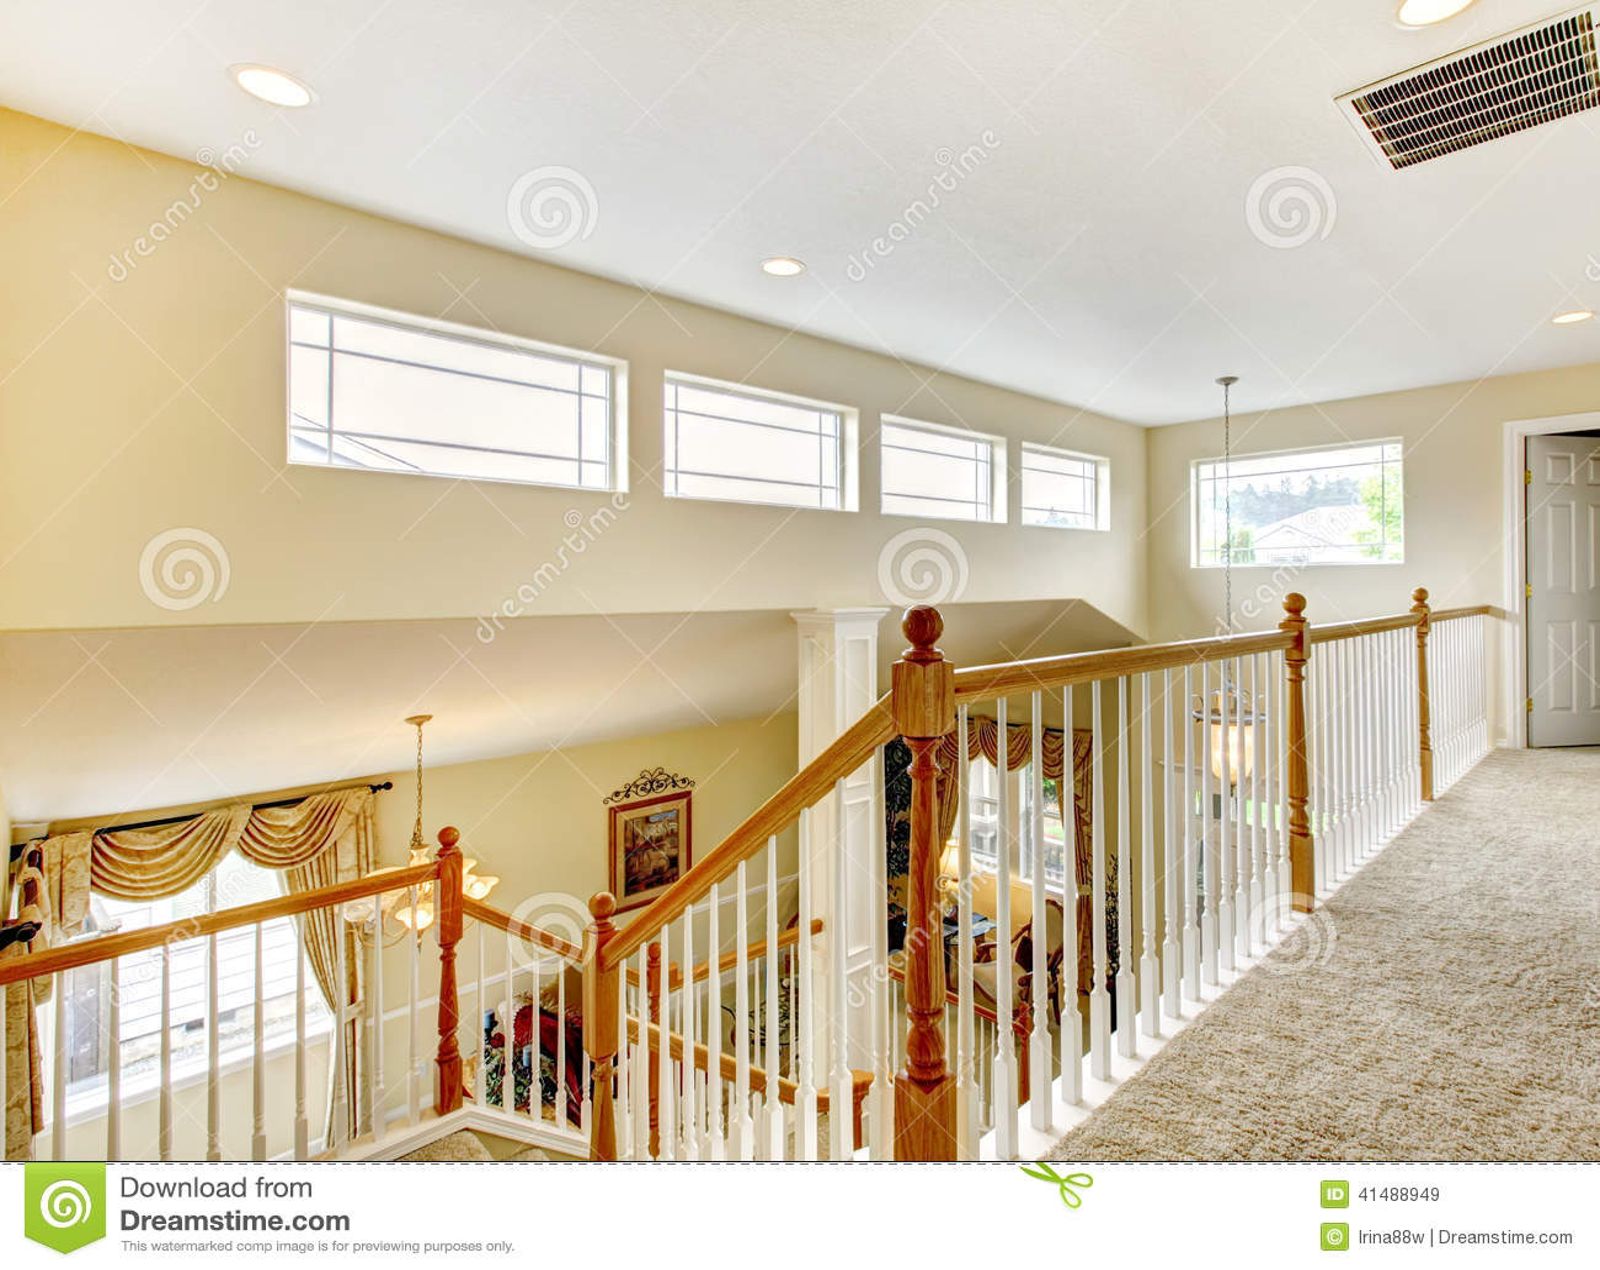 House Inteior With Indoor Balcony Stock Photo - Image: 41488949